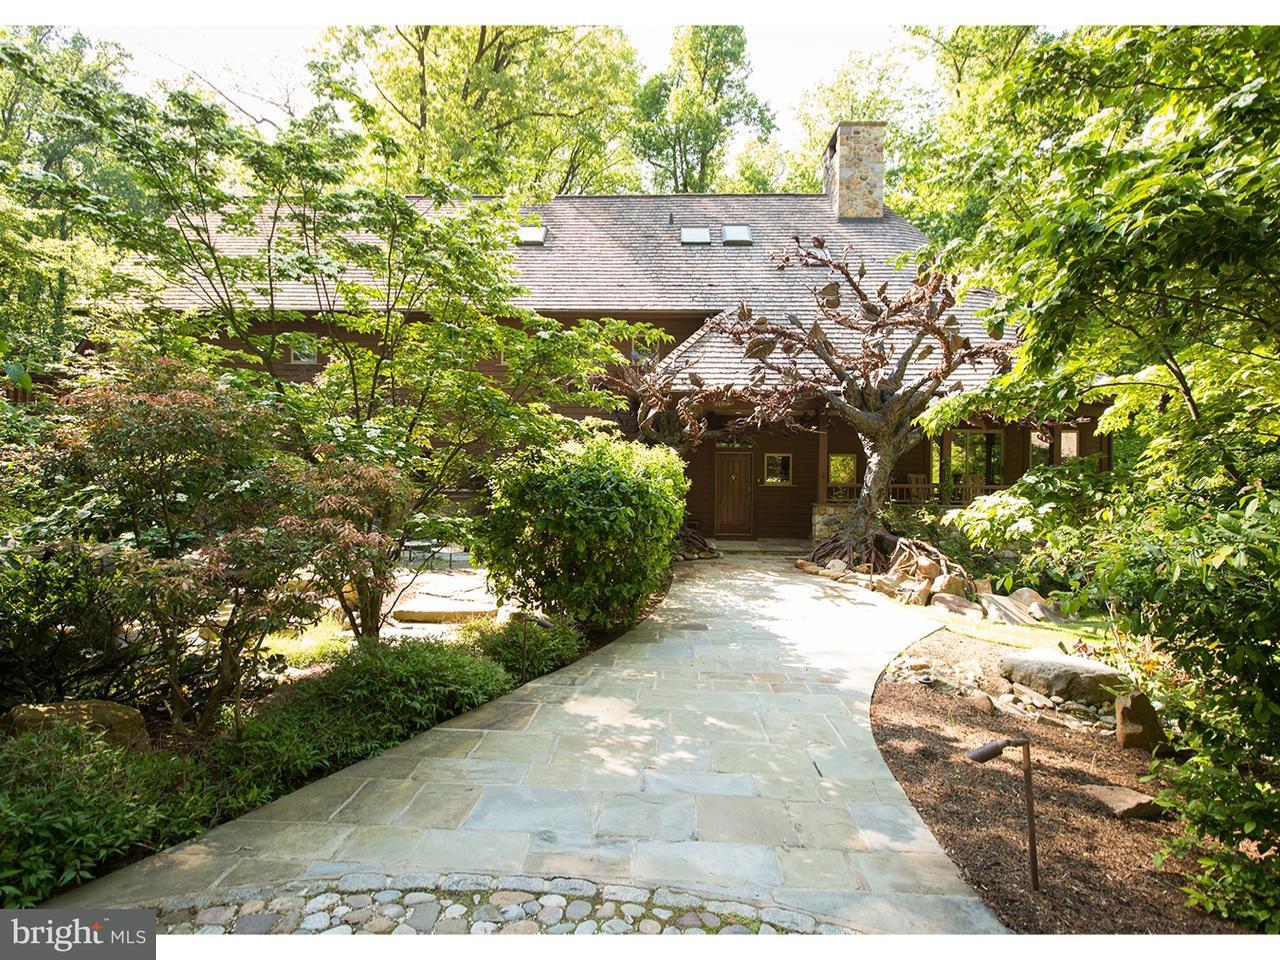 Single Family Home for Sale at 25 MOUNTAIN LAUREL Lane Malvern, Pennsylvania 19355 United States